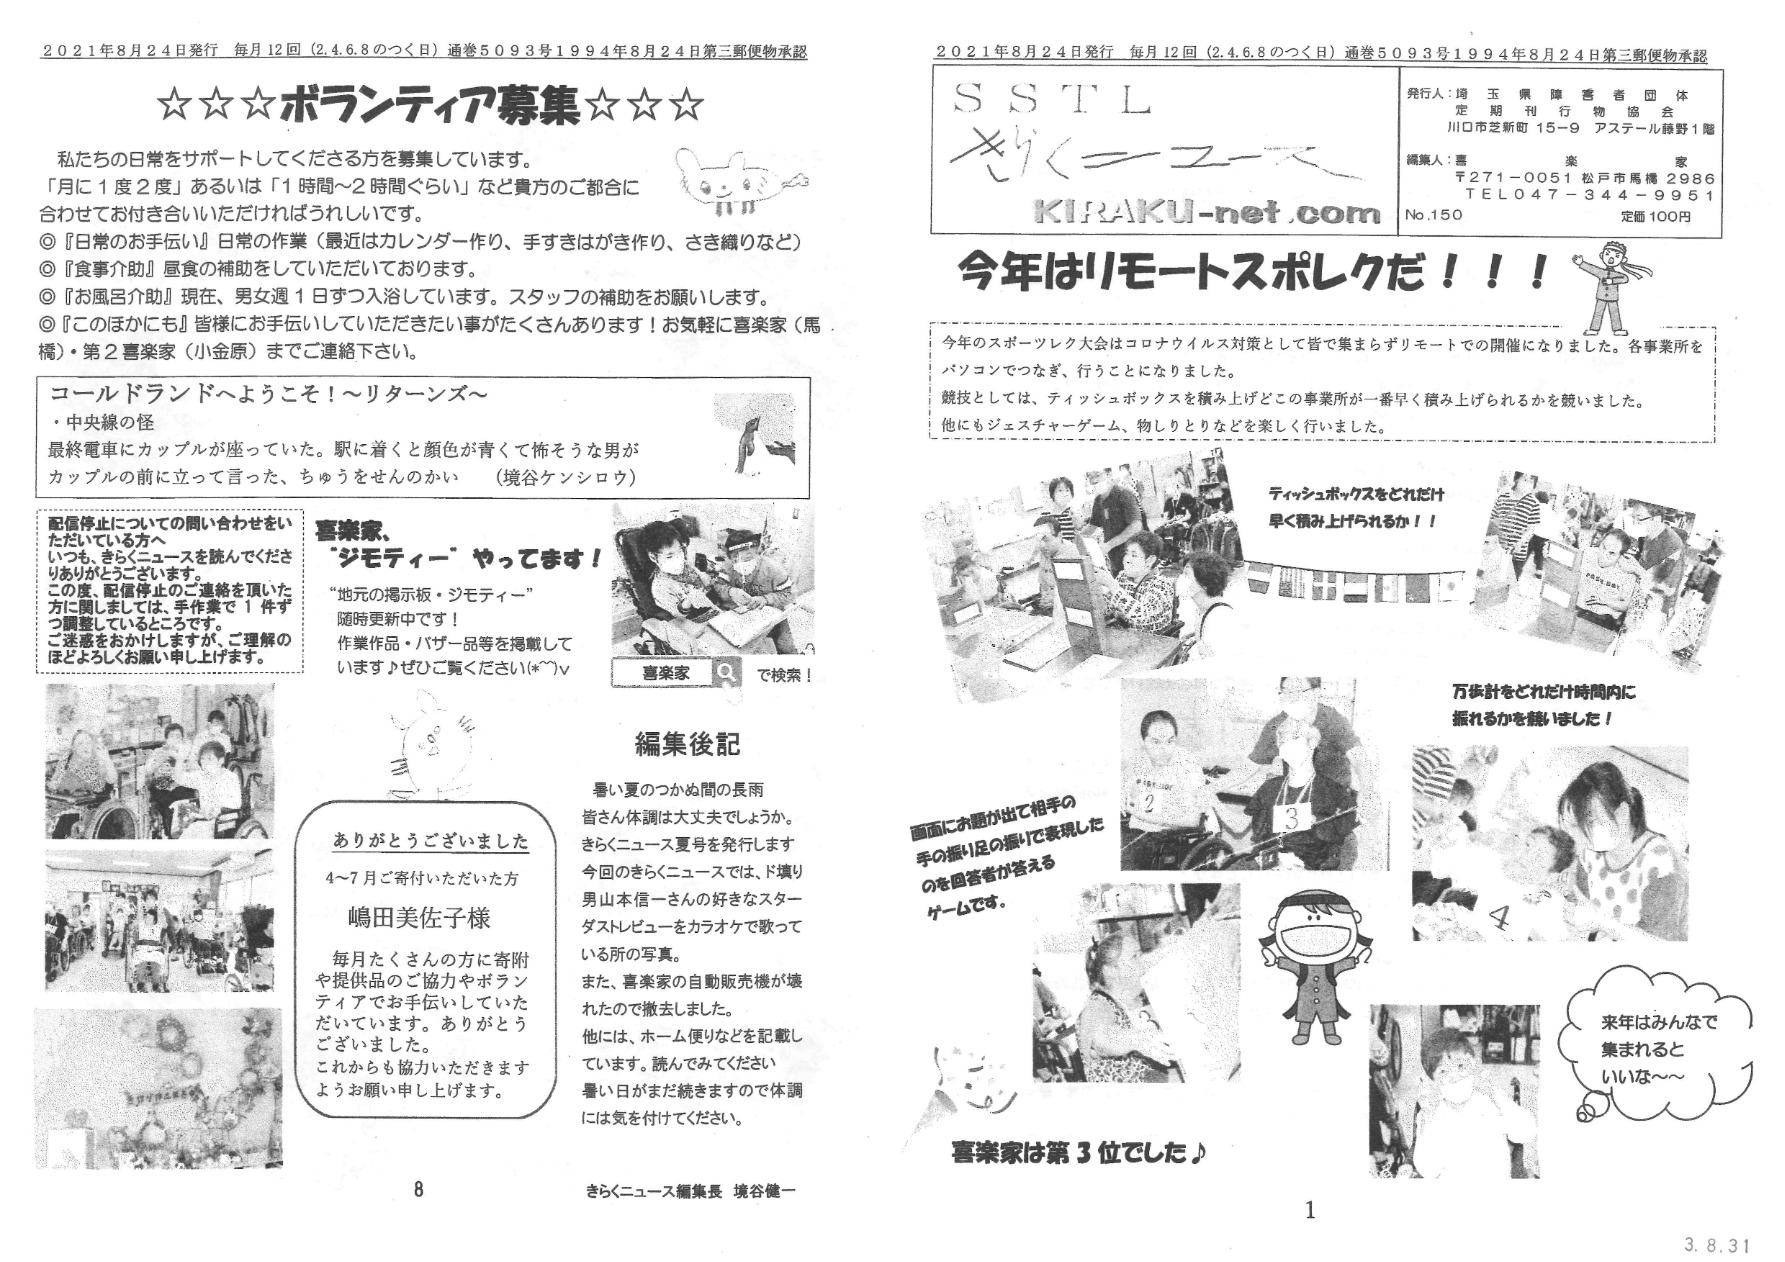 SSTL きらくニュース No.150